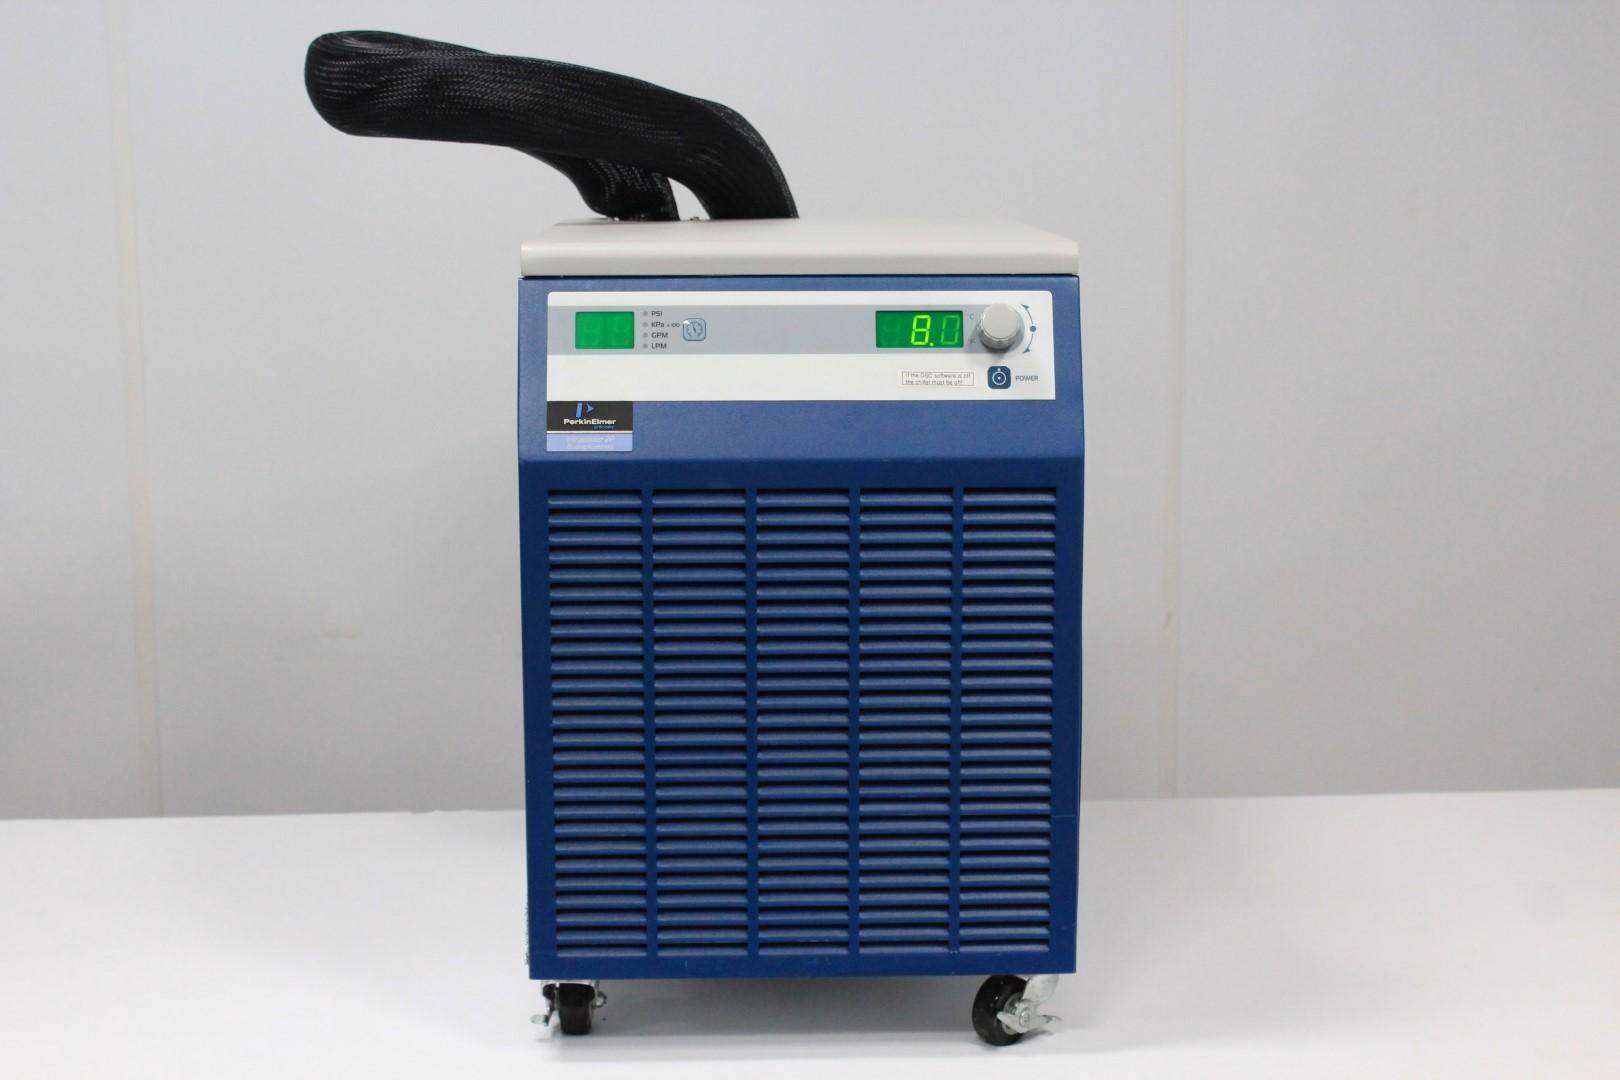 Perkin Intracooler 2P Cooler PolyScience VLT100 Cooling Chiller -40C to -80C